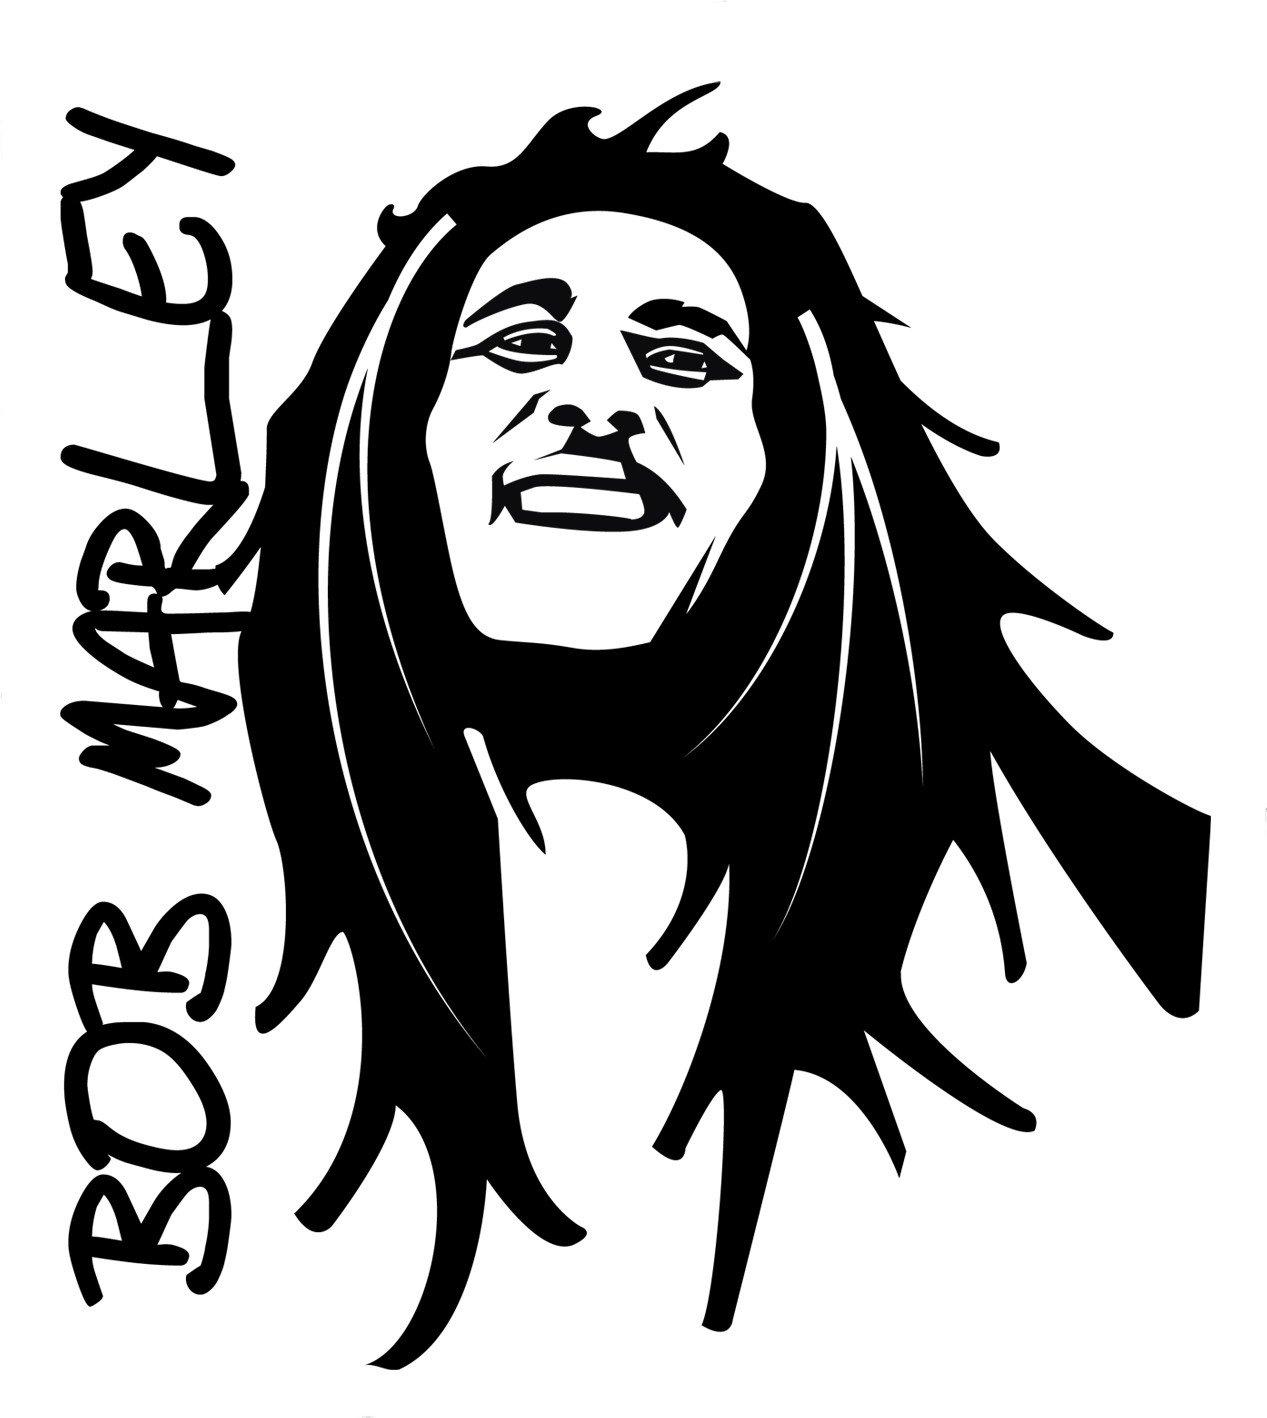 Bob Marley Cartoon Drawing at GetDrawingscom  Free for